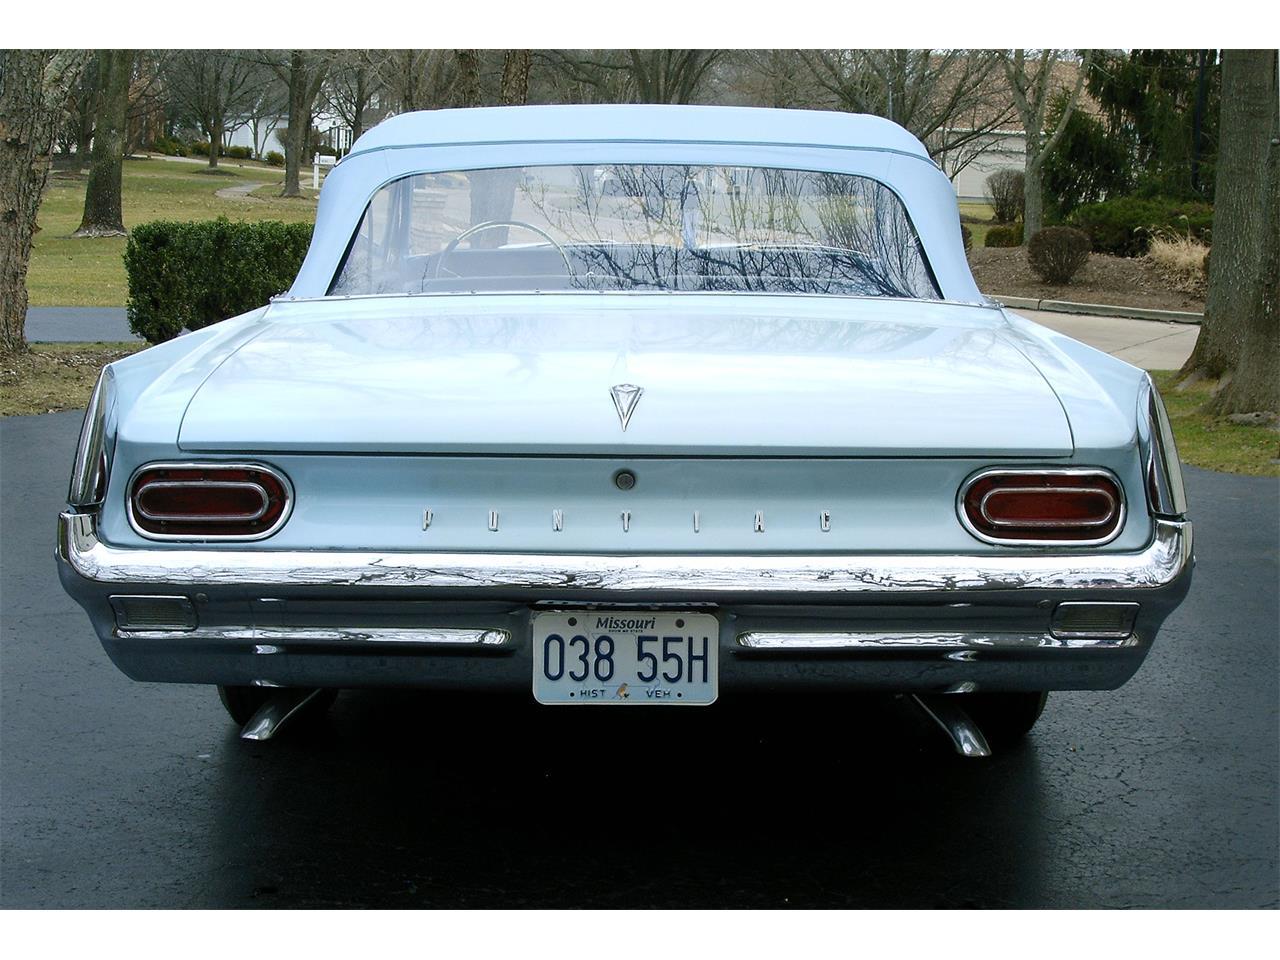 Chesterfield Car Dealers Missouri